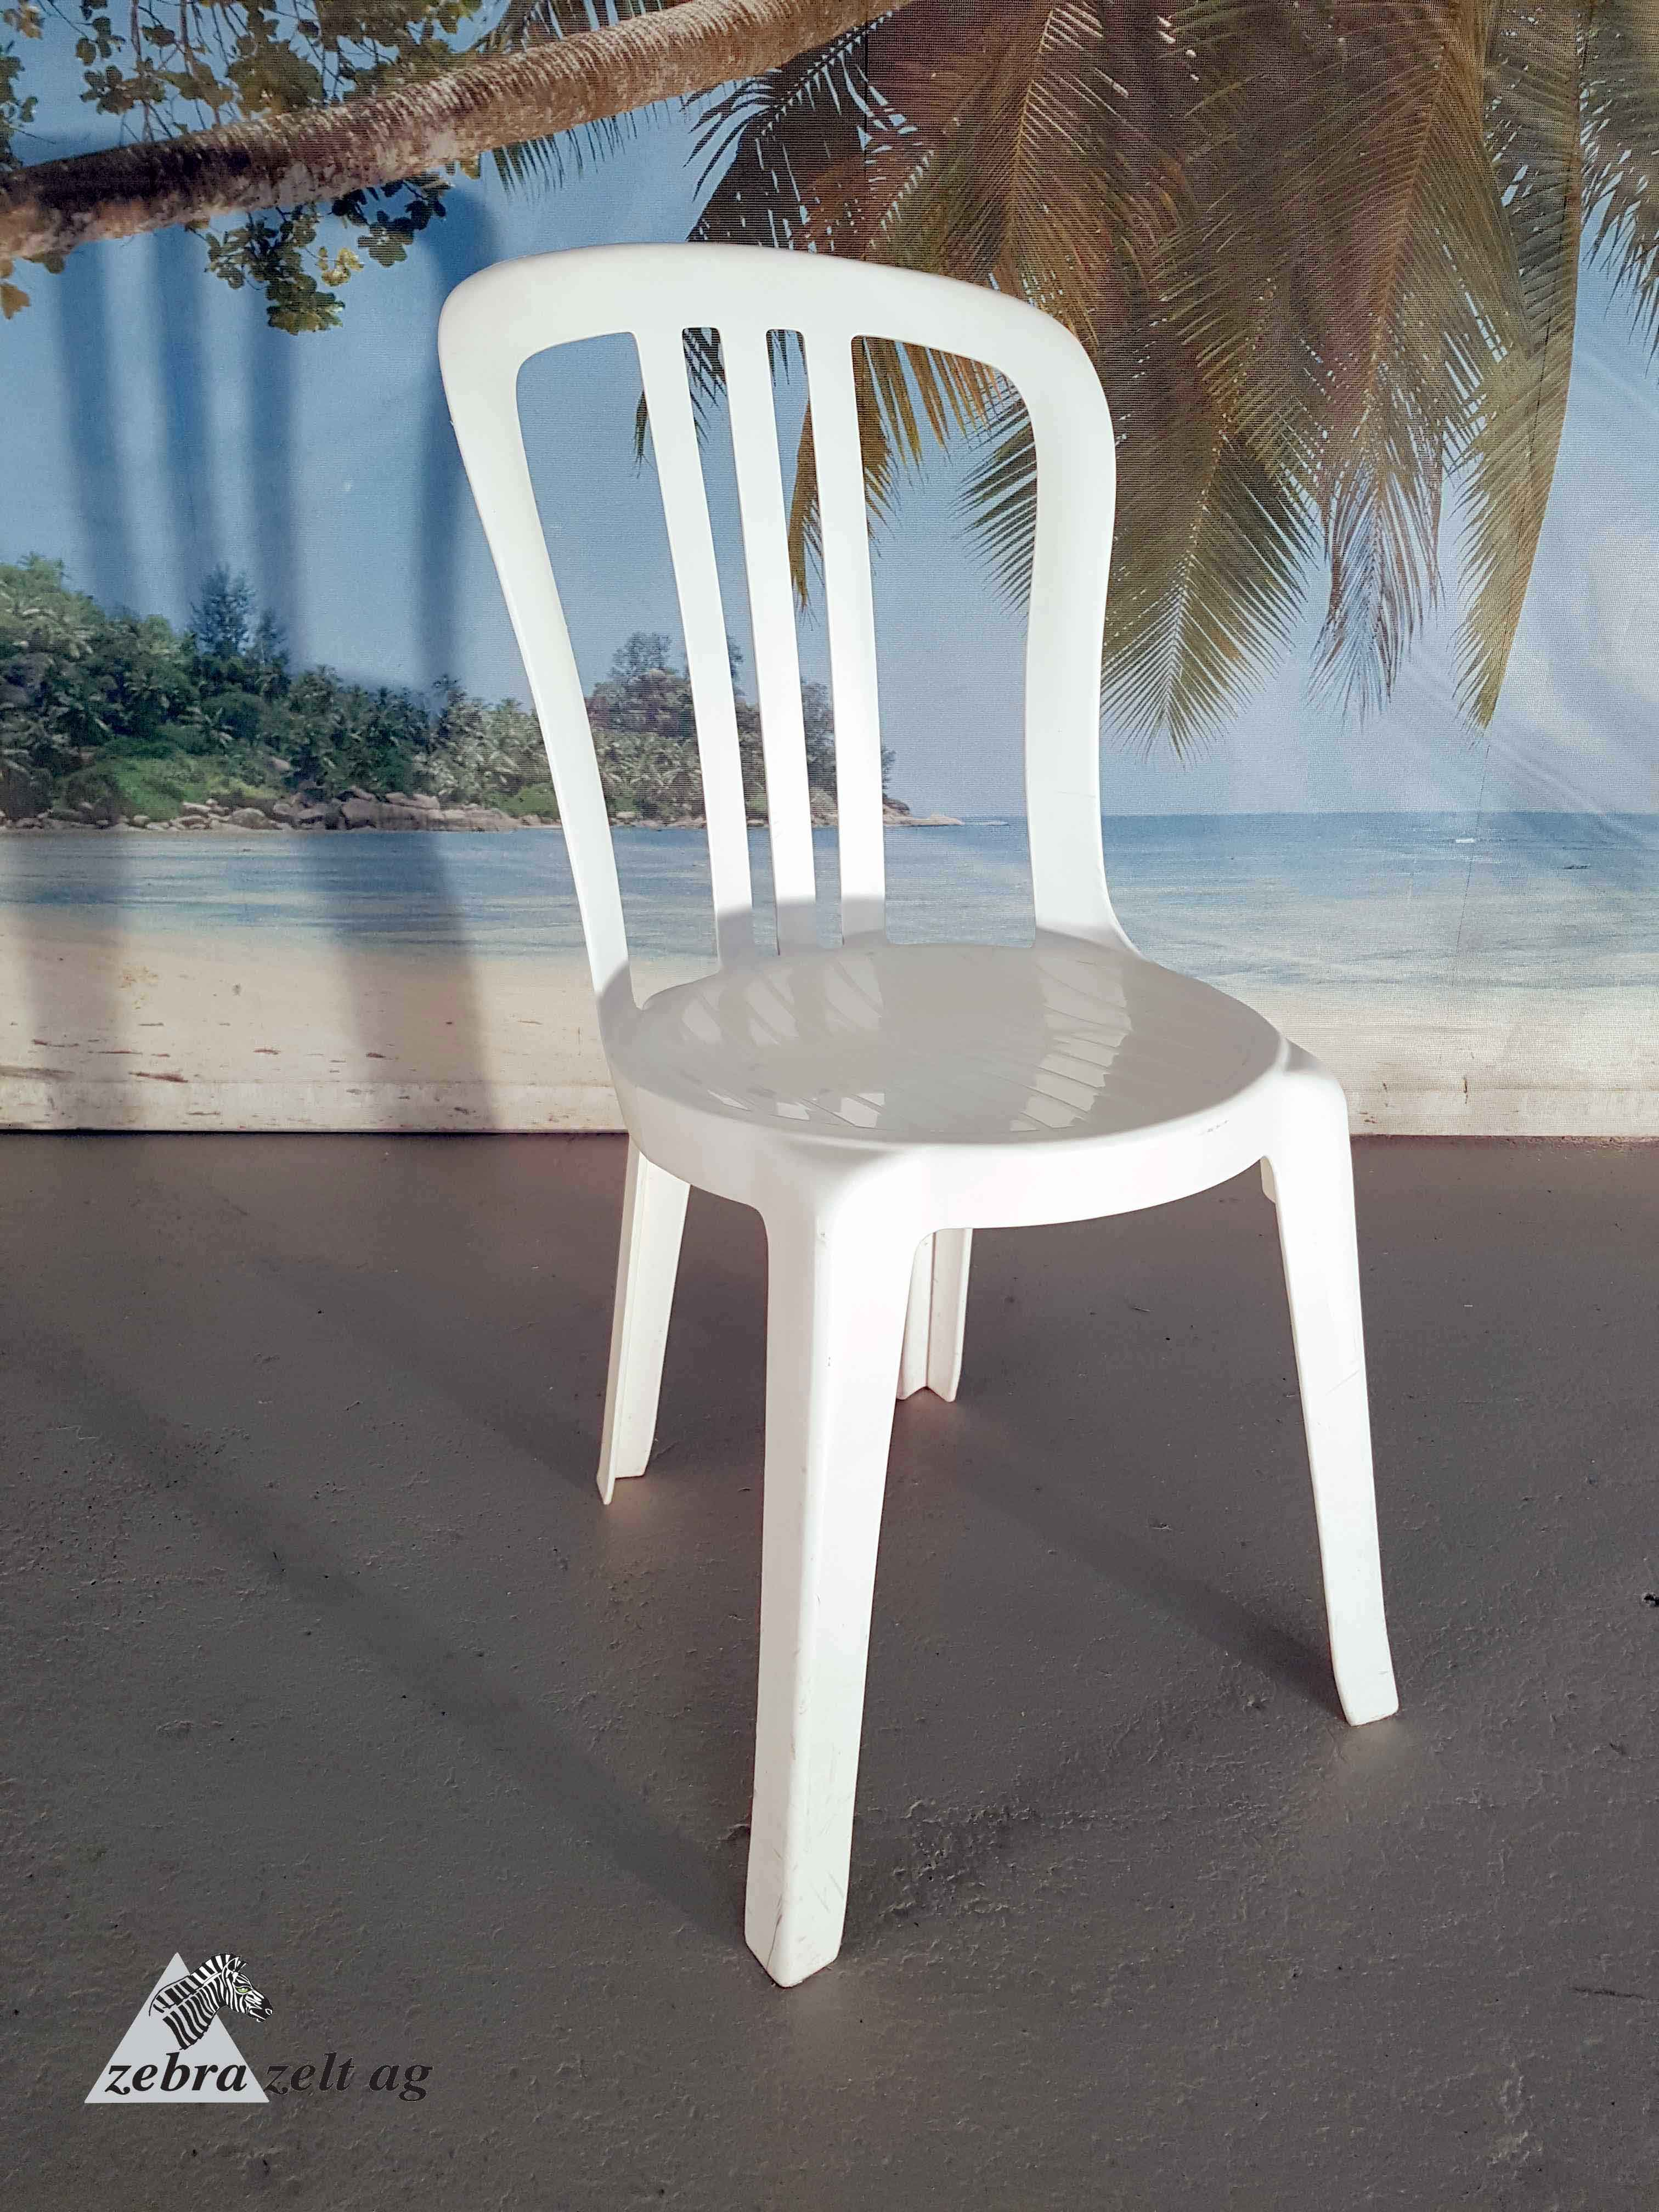 zebra zelt ag gr nichen miet und kaufzelte 062 842 04 10. Black Bedroom Furniture Sets. Home Design Ideas